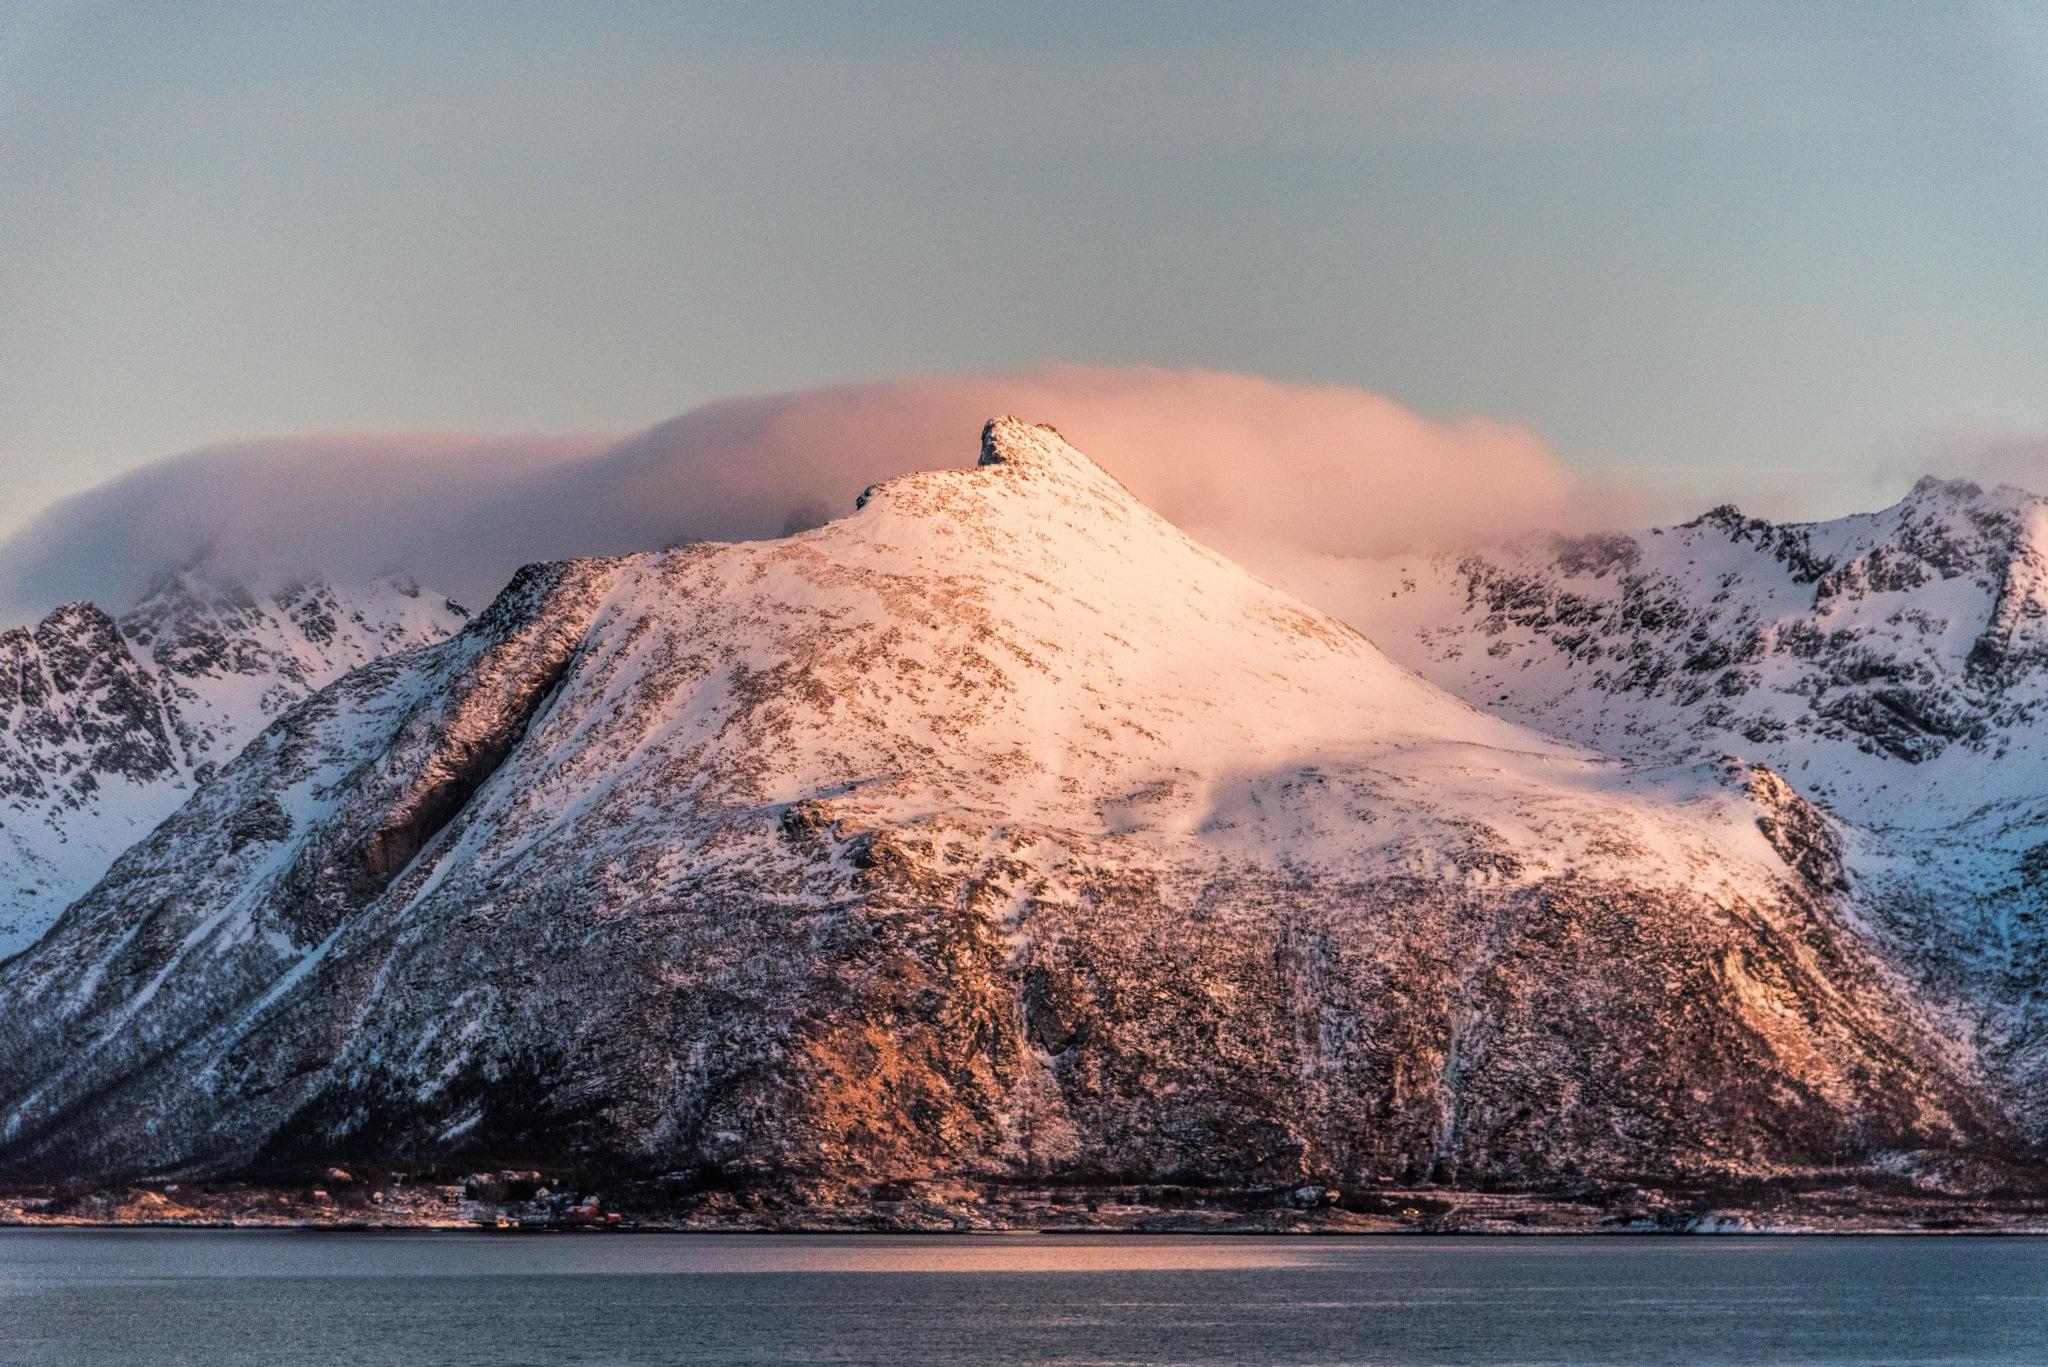 Shining mountain by Angela Blasche